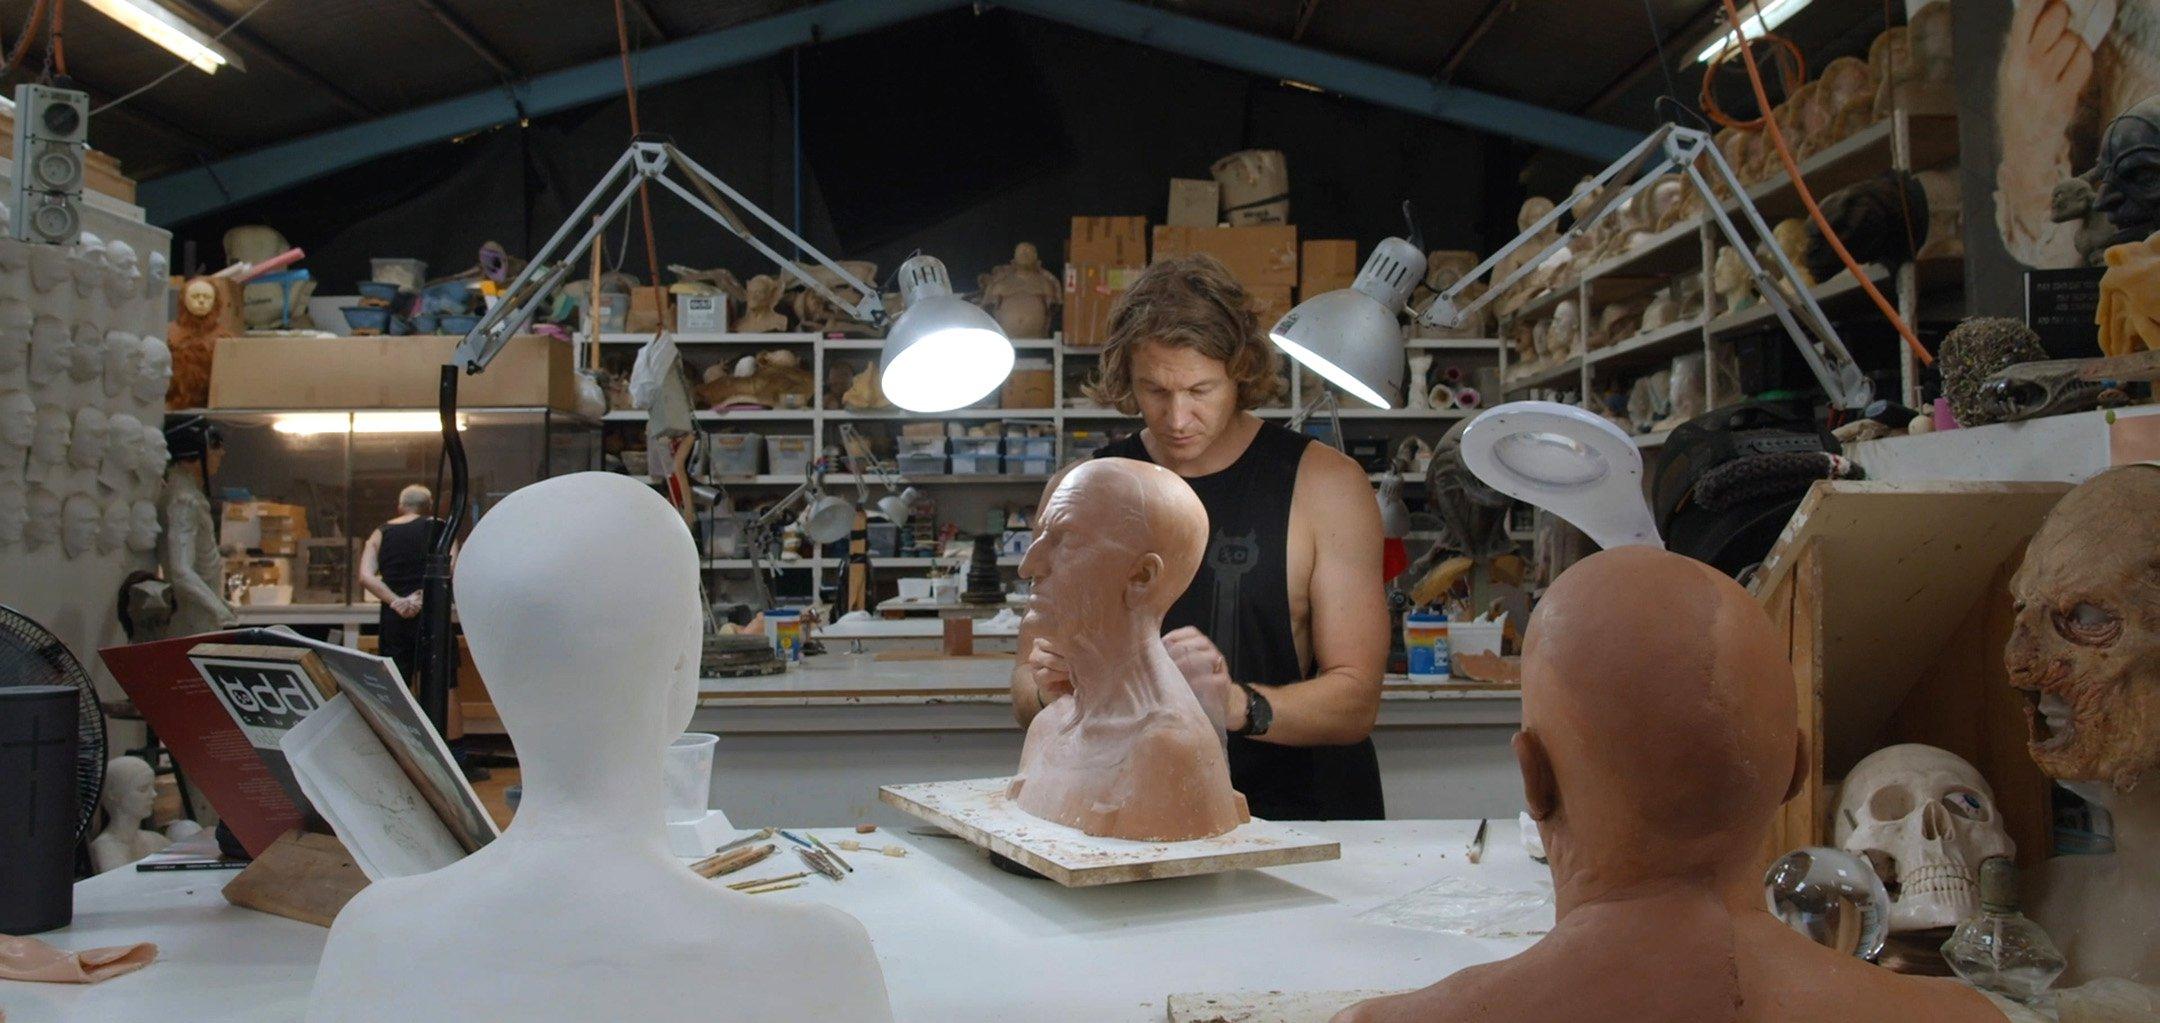 Adam Johanson working on a prosthetic witch head in Odd Studio -  long shot